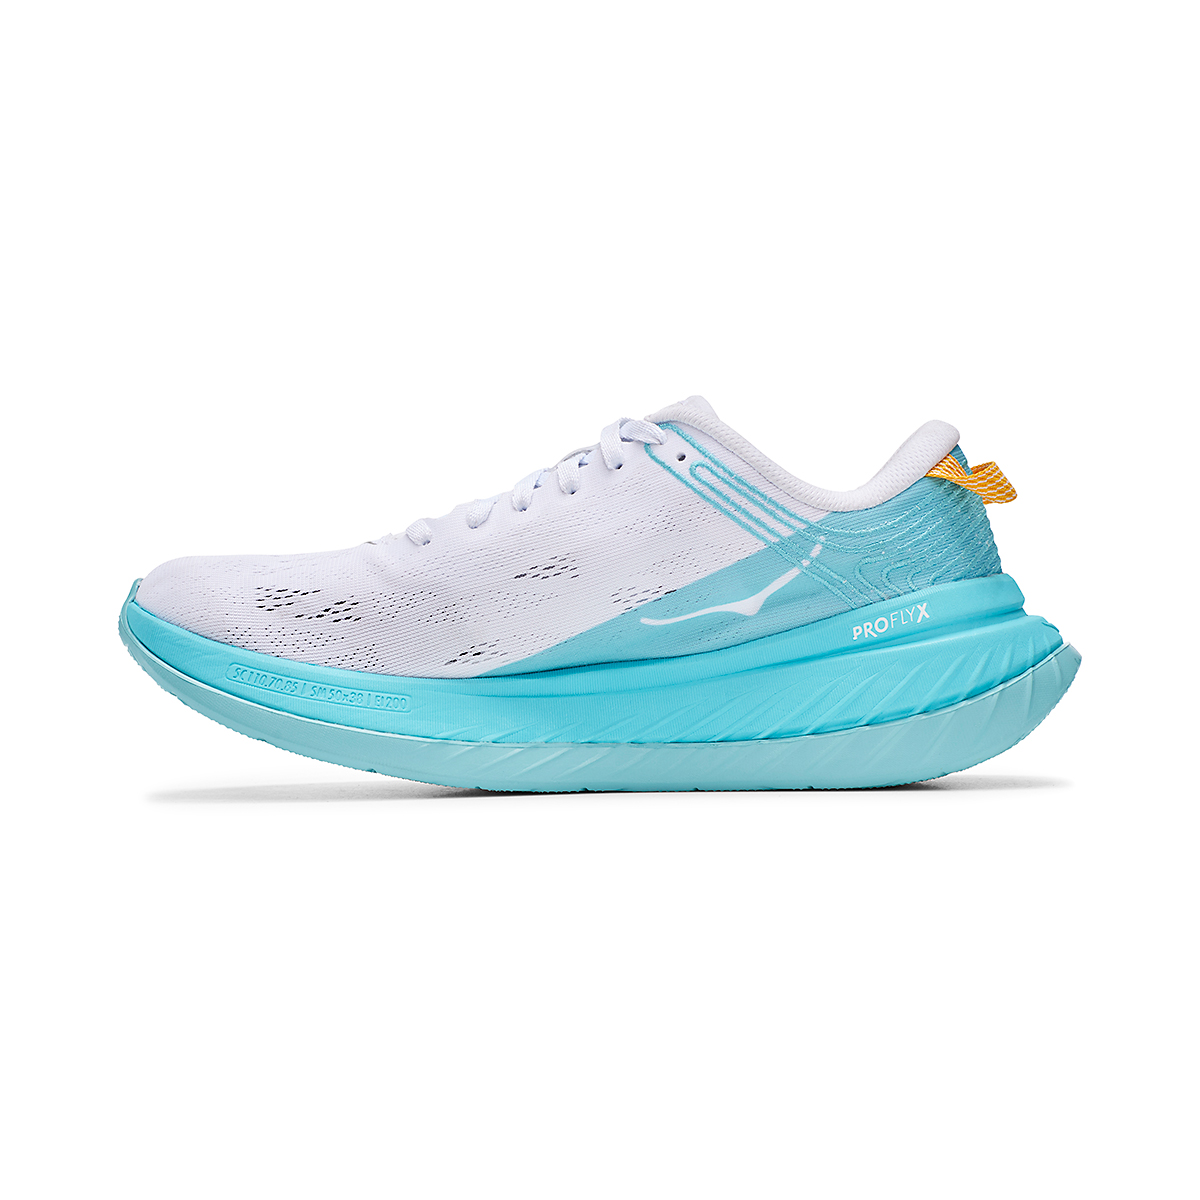 Women's Hoka One One Carbon X Running Shoe - Color: White/Angel Blue - Size: 5 - Width: Regular, White/Angel Blue, large, image 2